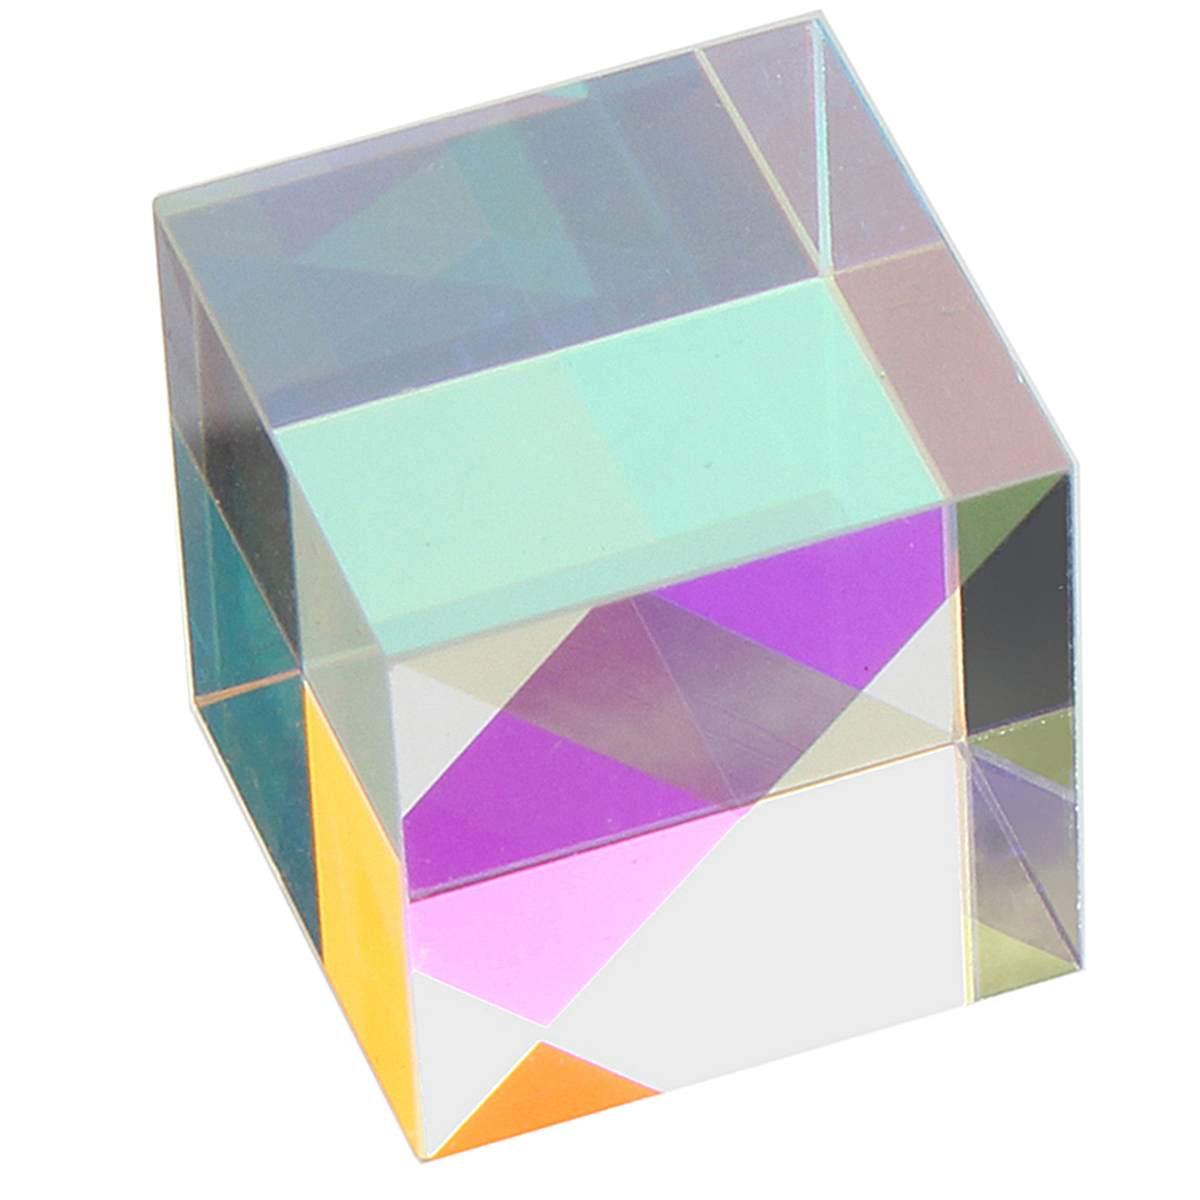 20x20mm K9 Cube Prism Laser Beam Combine Cube Splitter Glass Decor Square Cube RGB Instruments Teaching Tools Decoration